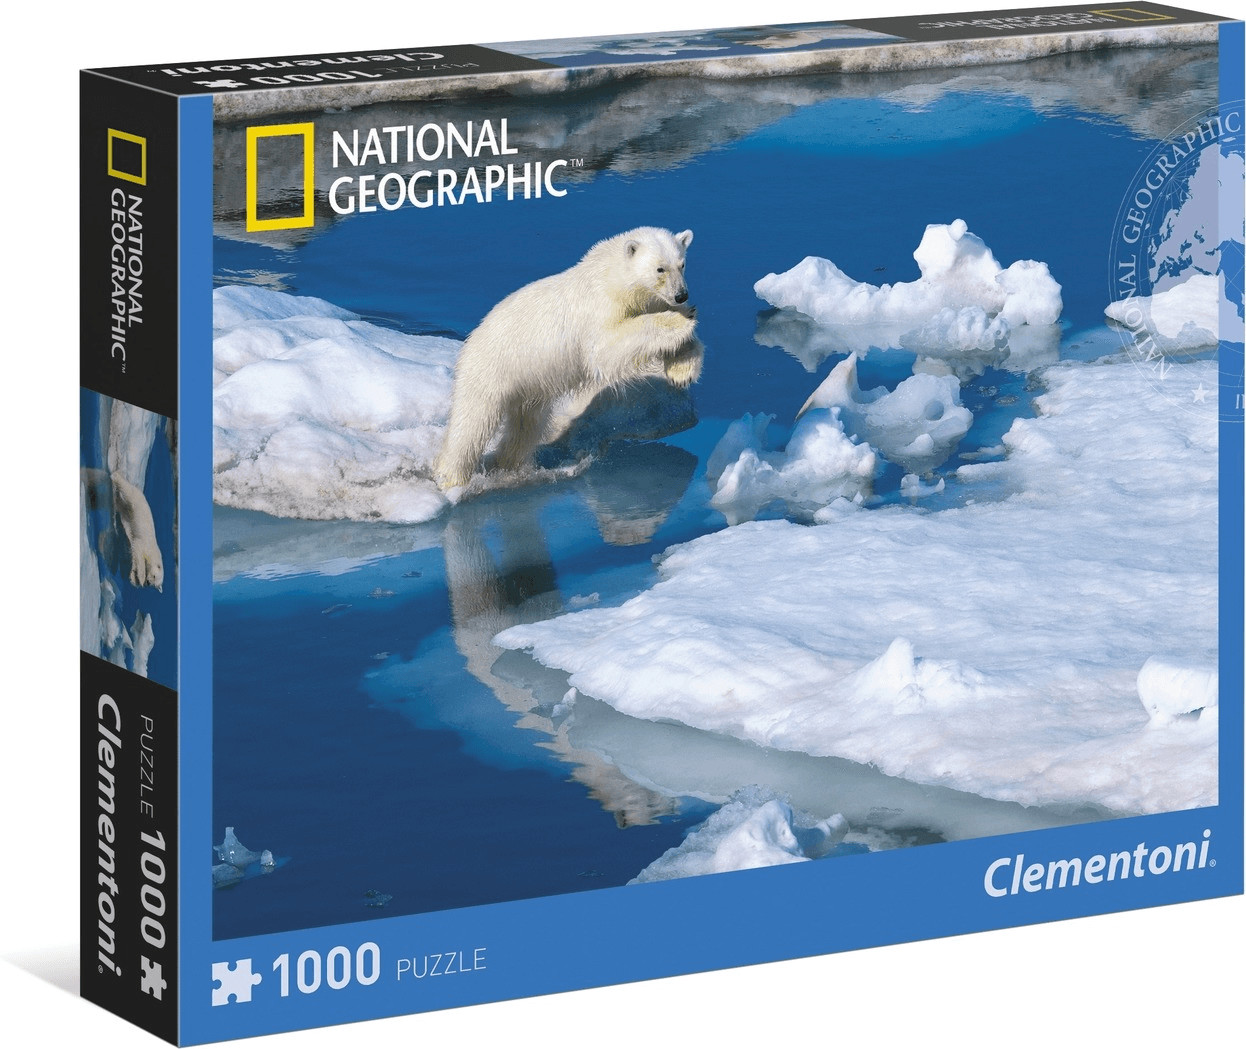 Clementoni National Geographic (39304)